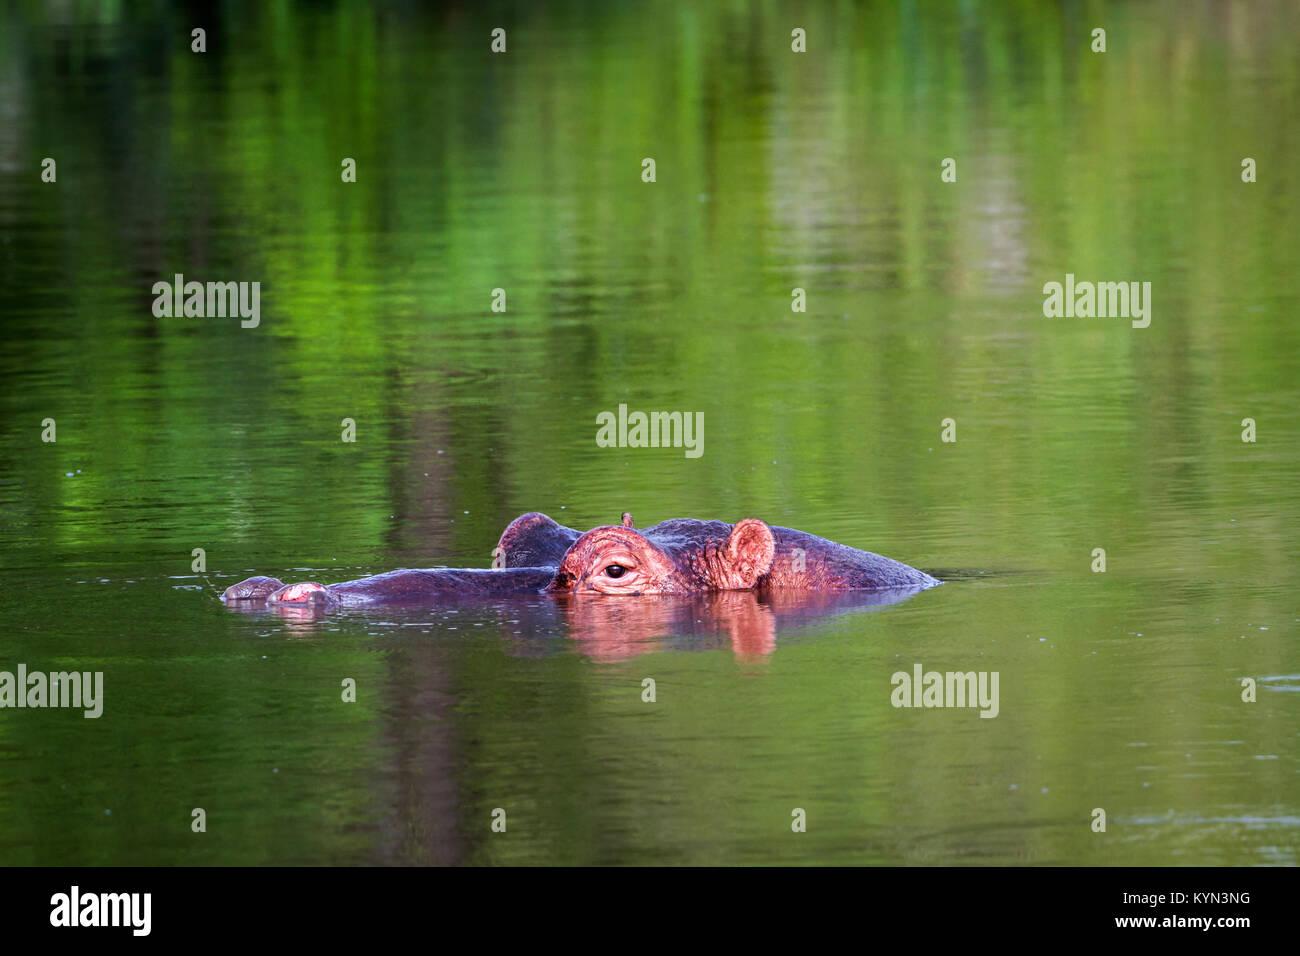 Hippopotamus in Kruger national park, South Africa ; Specie Hippopotamus amphibius family of Hippopotamidae - Stock Image